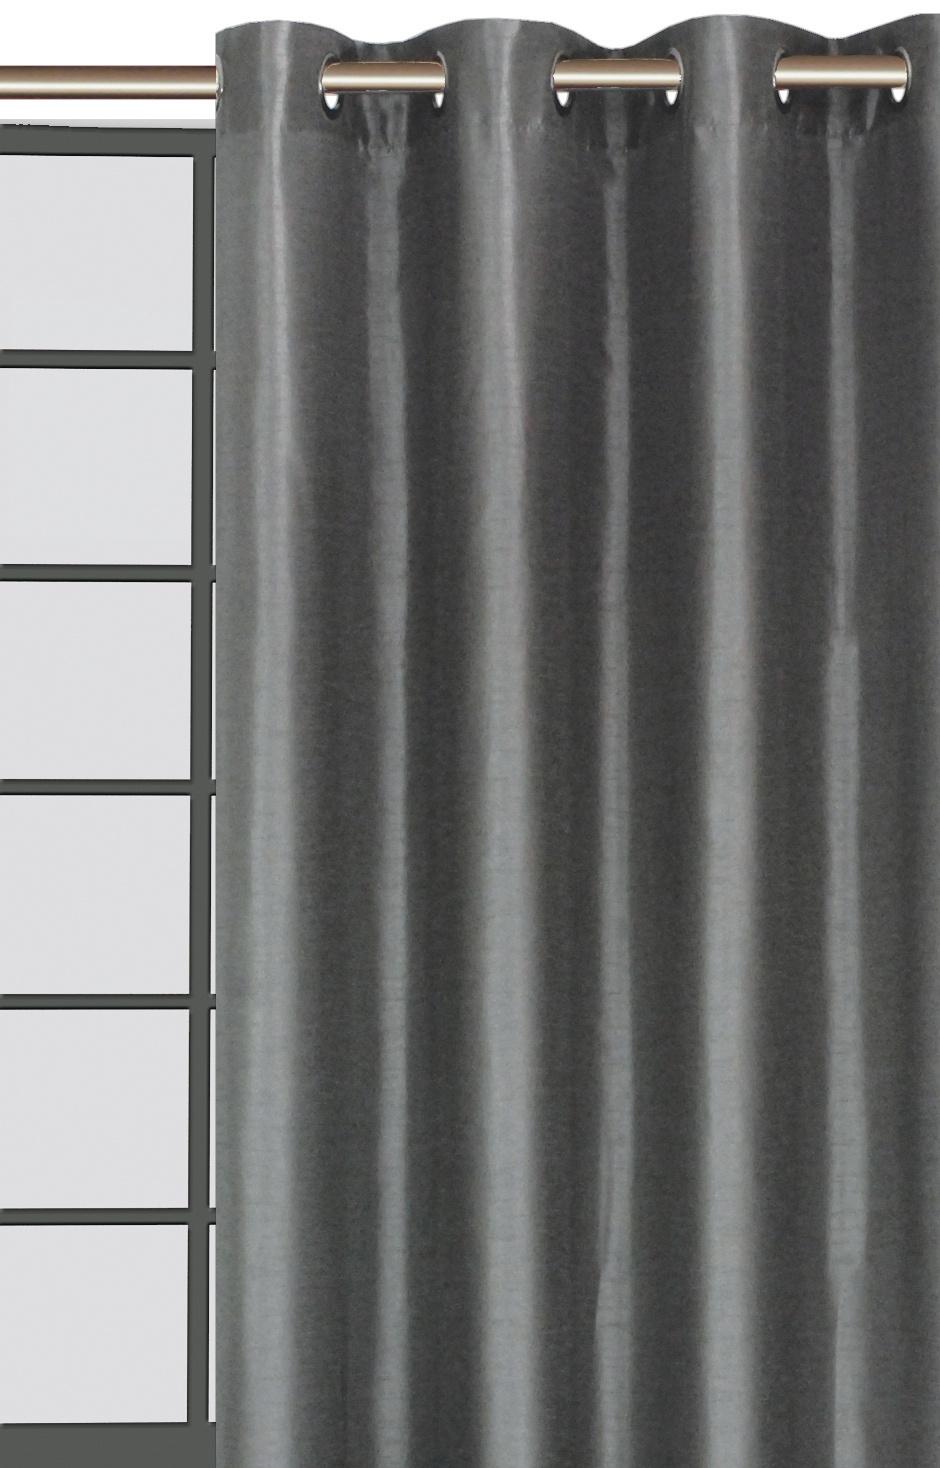 BALLERINA Gris / Grey